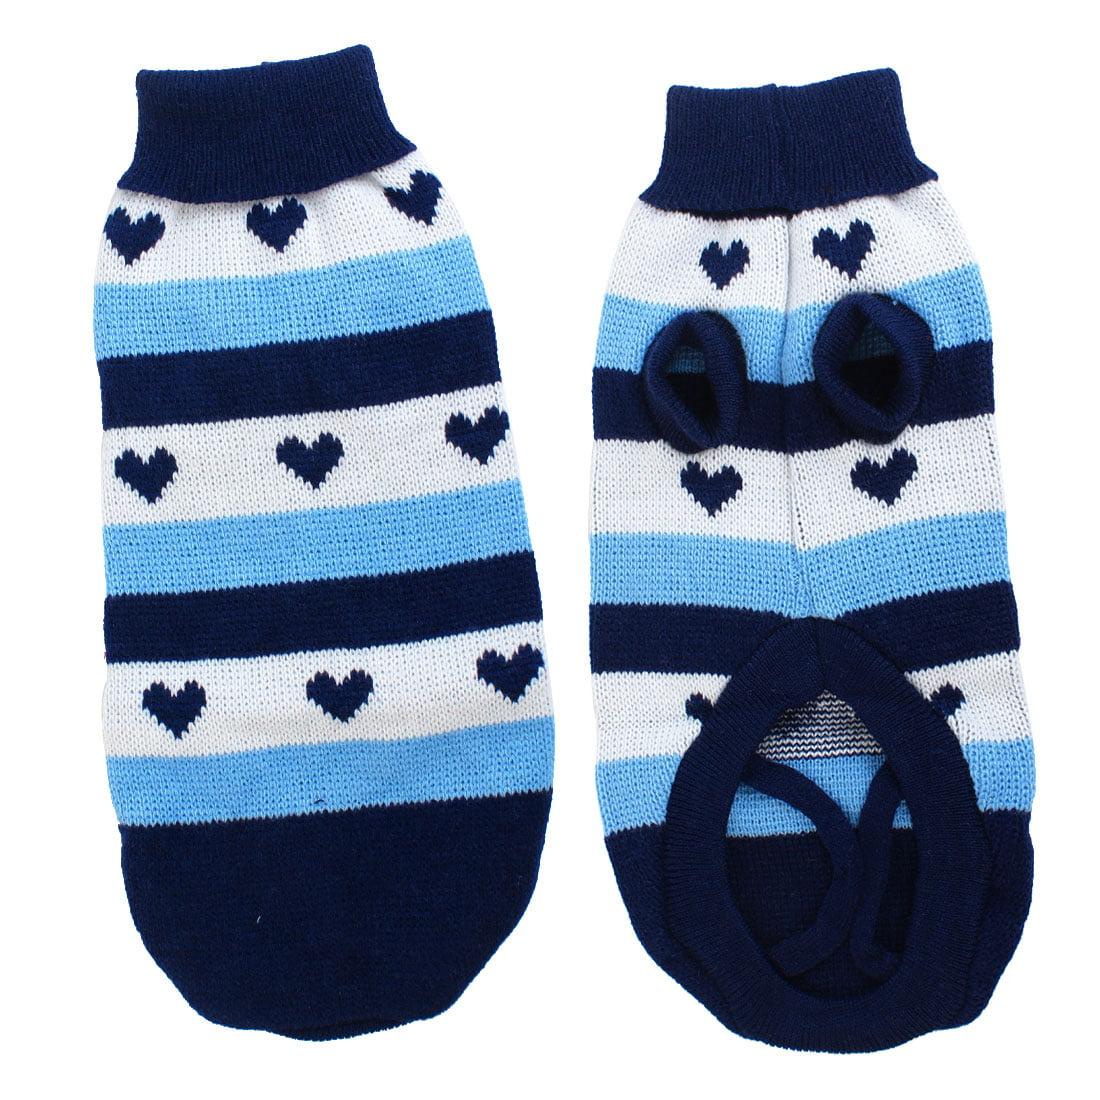 Warm Turtleneck Heart Print Pet Dog Cat Apparel Sweater Blue White ...